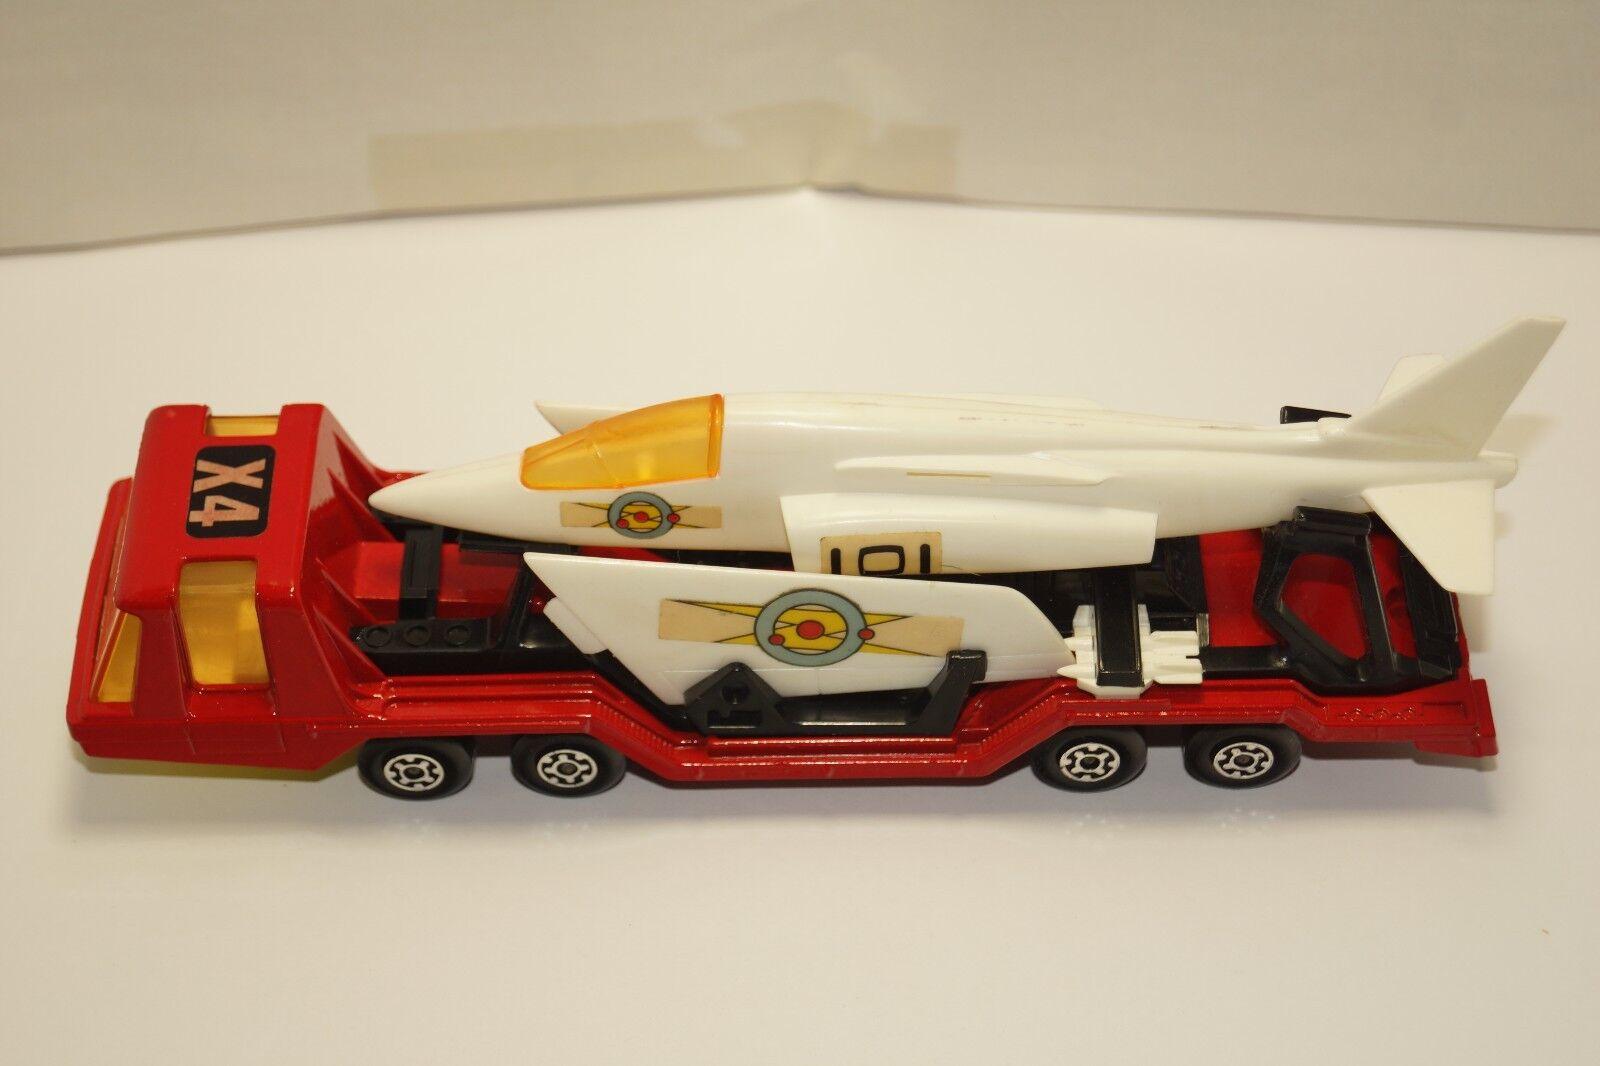 Original Matchbox-Super Reyes-K-13-2 - K-114 - Transporter (avión)